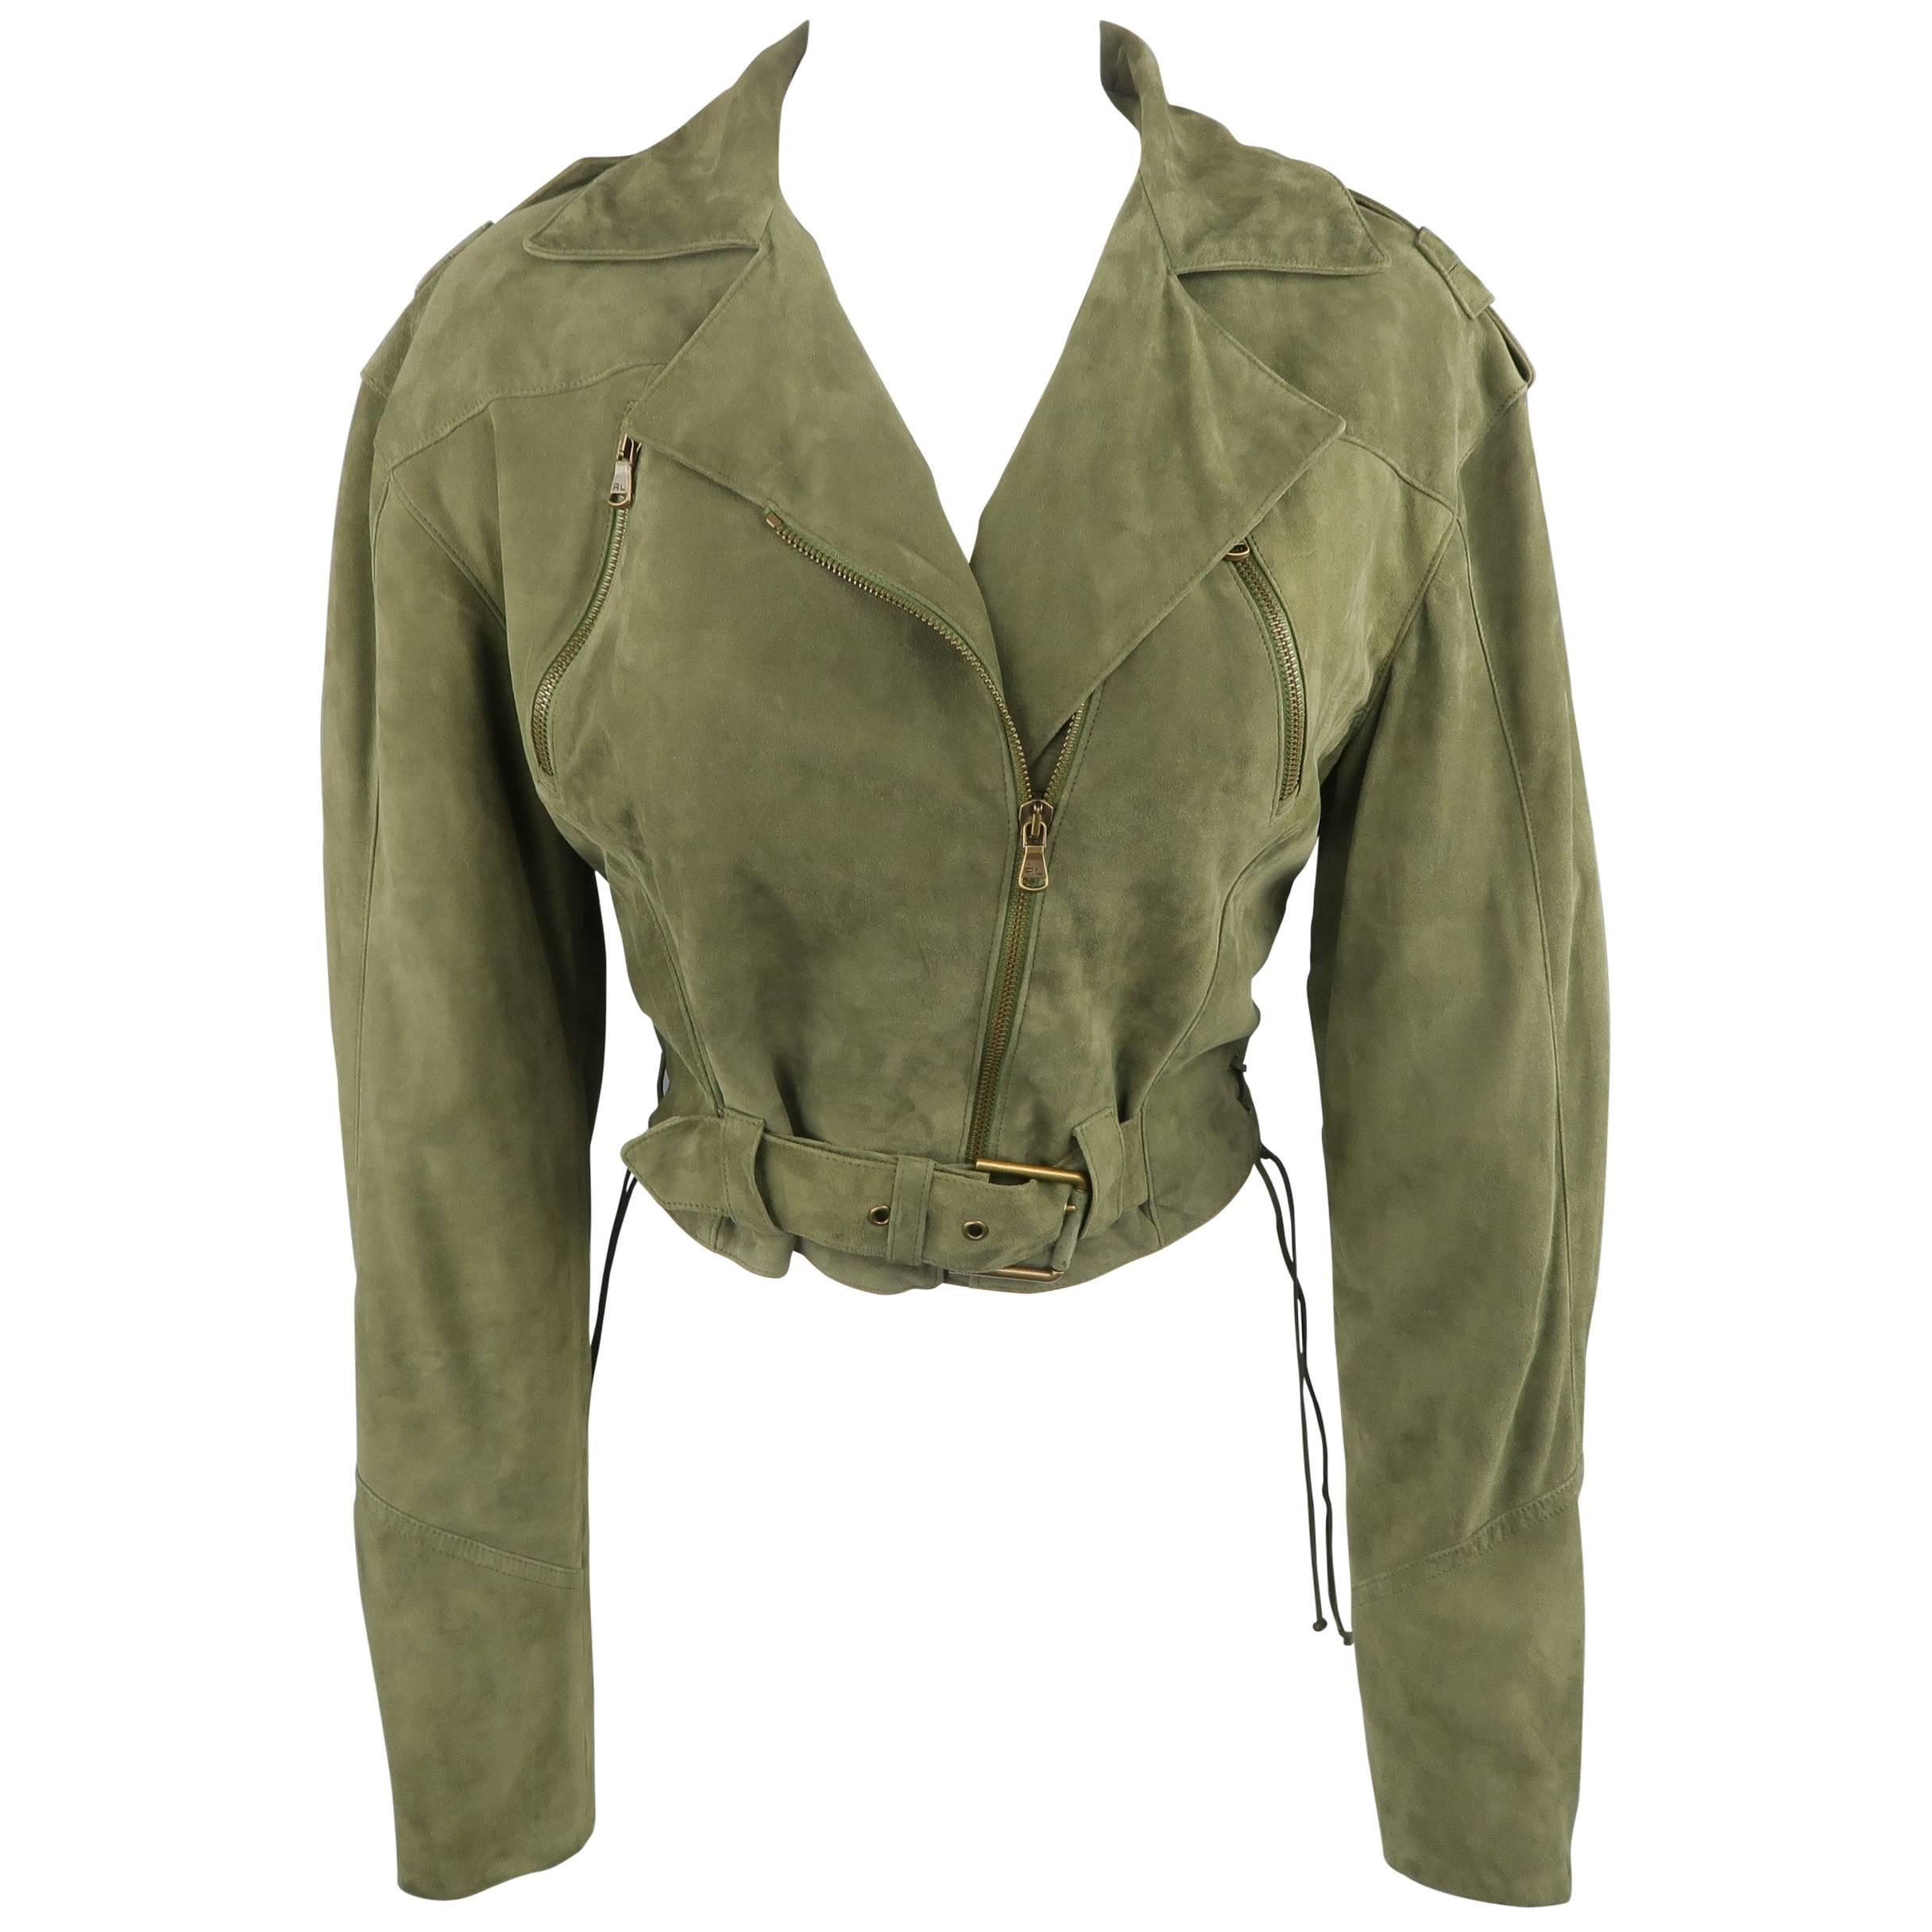 RALPH LAUREN Size 6 Olive Suede Cropped Lace Up Biker Jacket